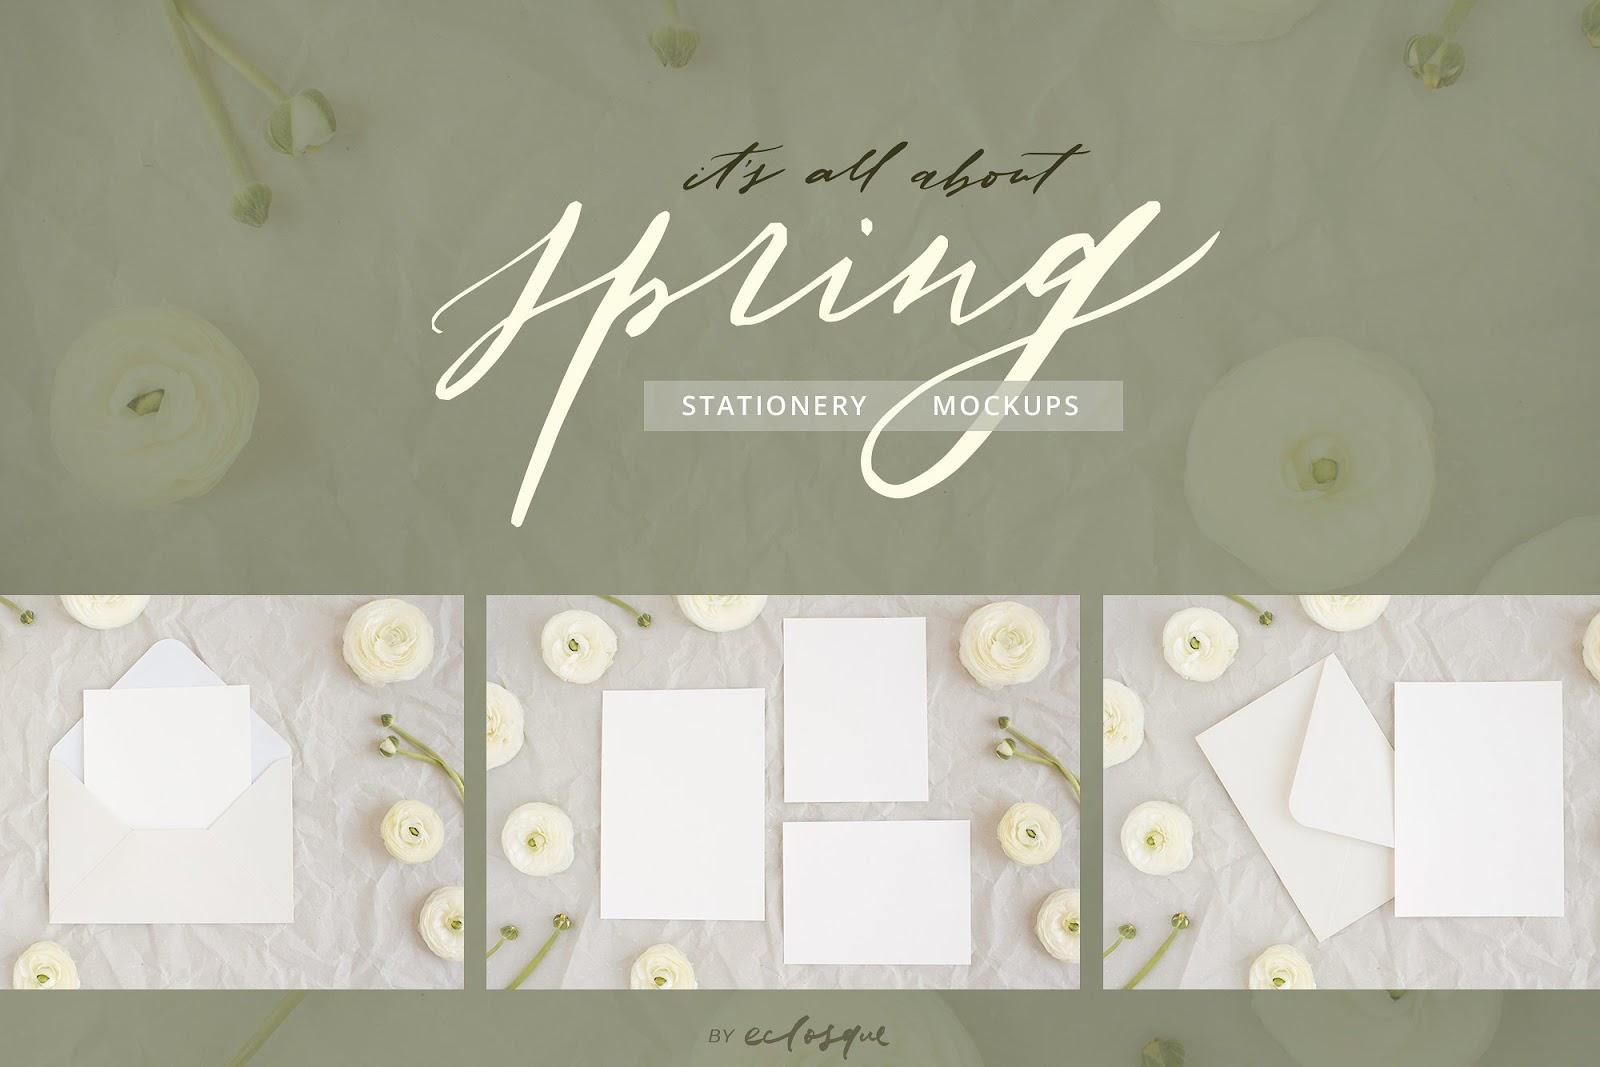 Spring Styled Stationery Mockups